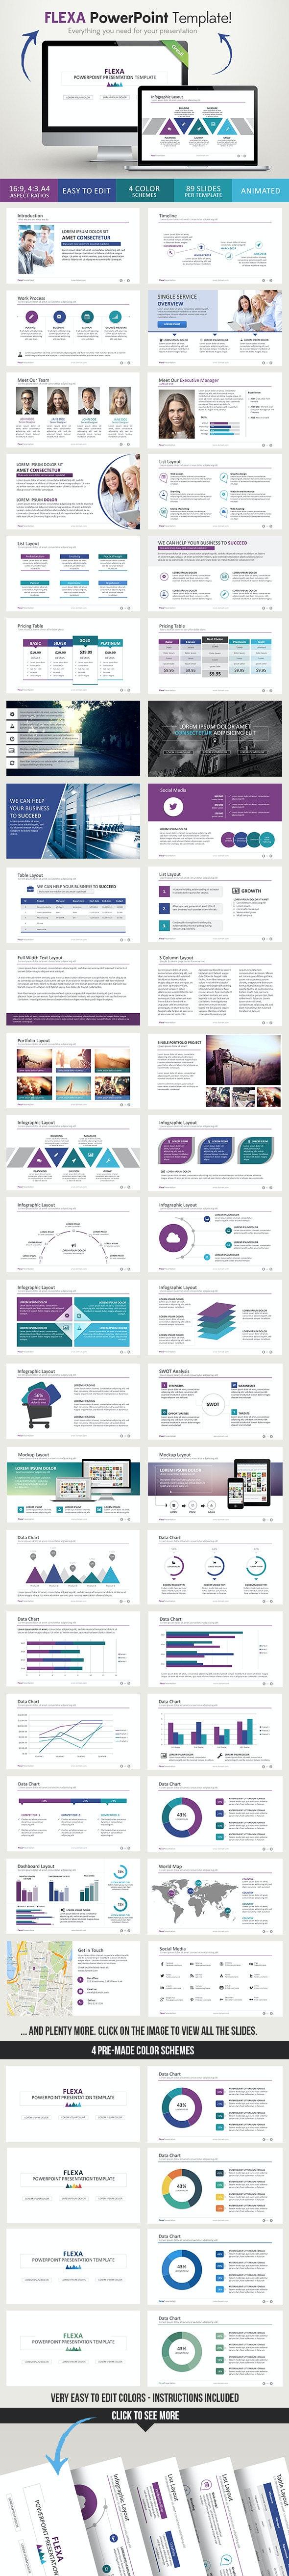 Flexa PowerPoint Presentation Template - Business PowerPoint Templates